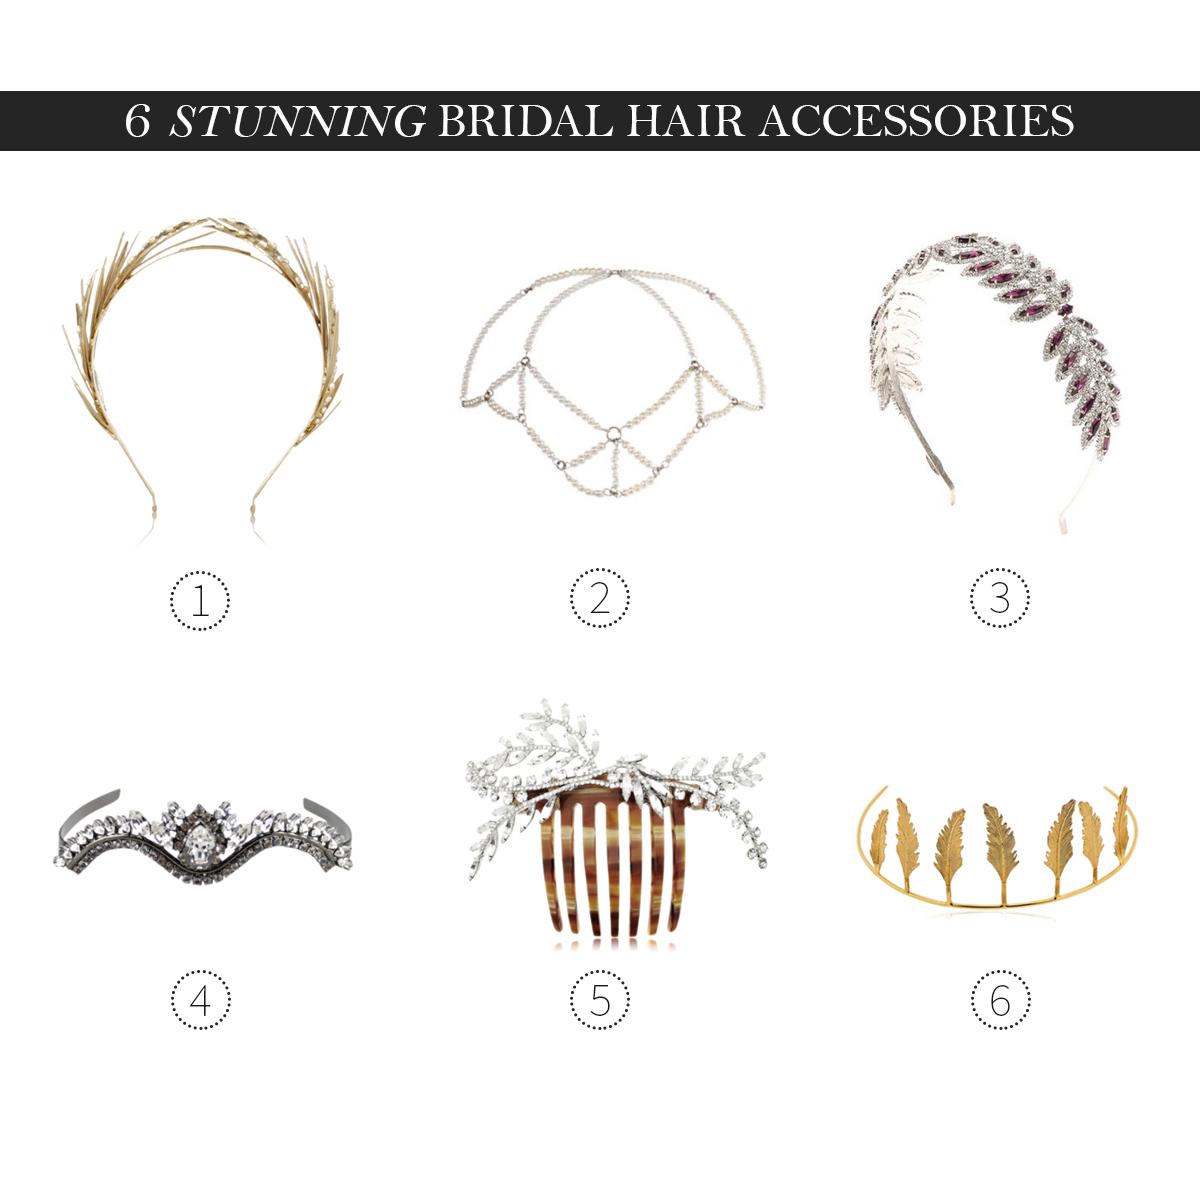 AZAZIE_Bridal_Hair_Accessories